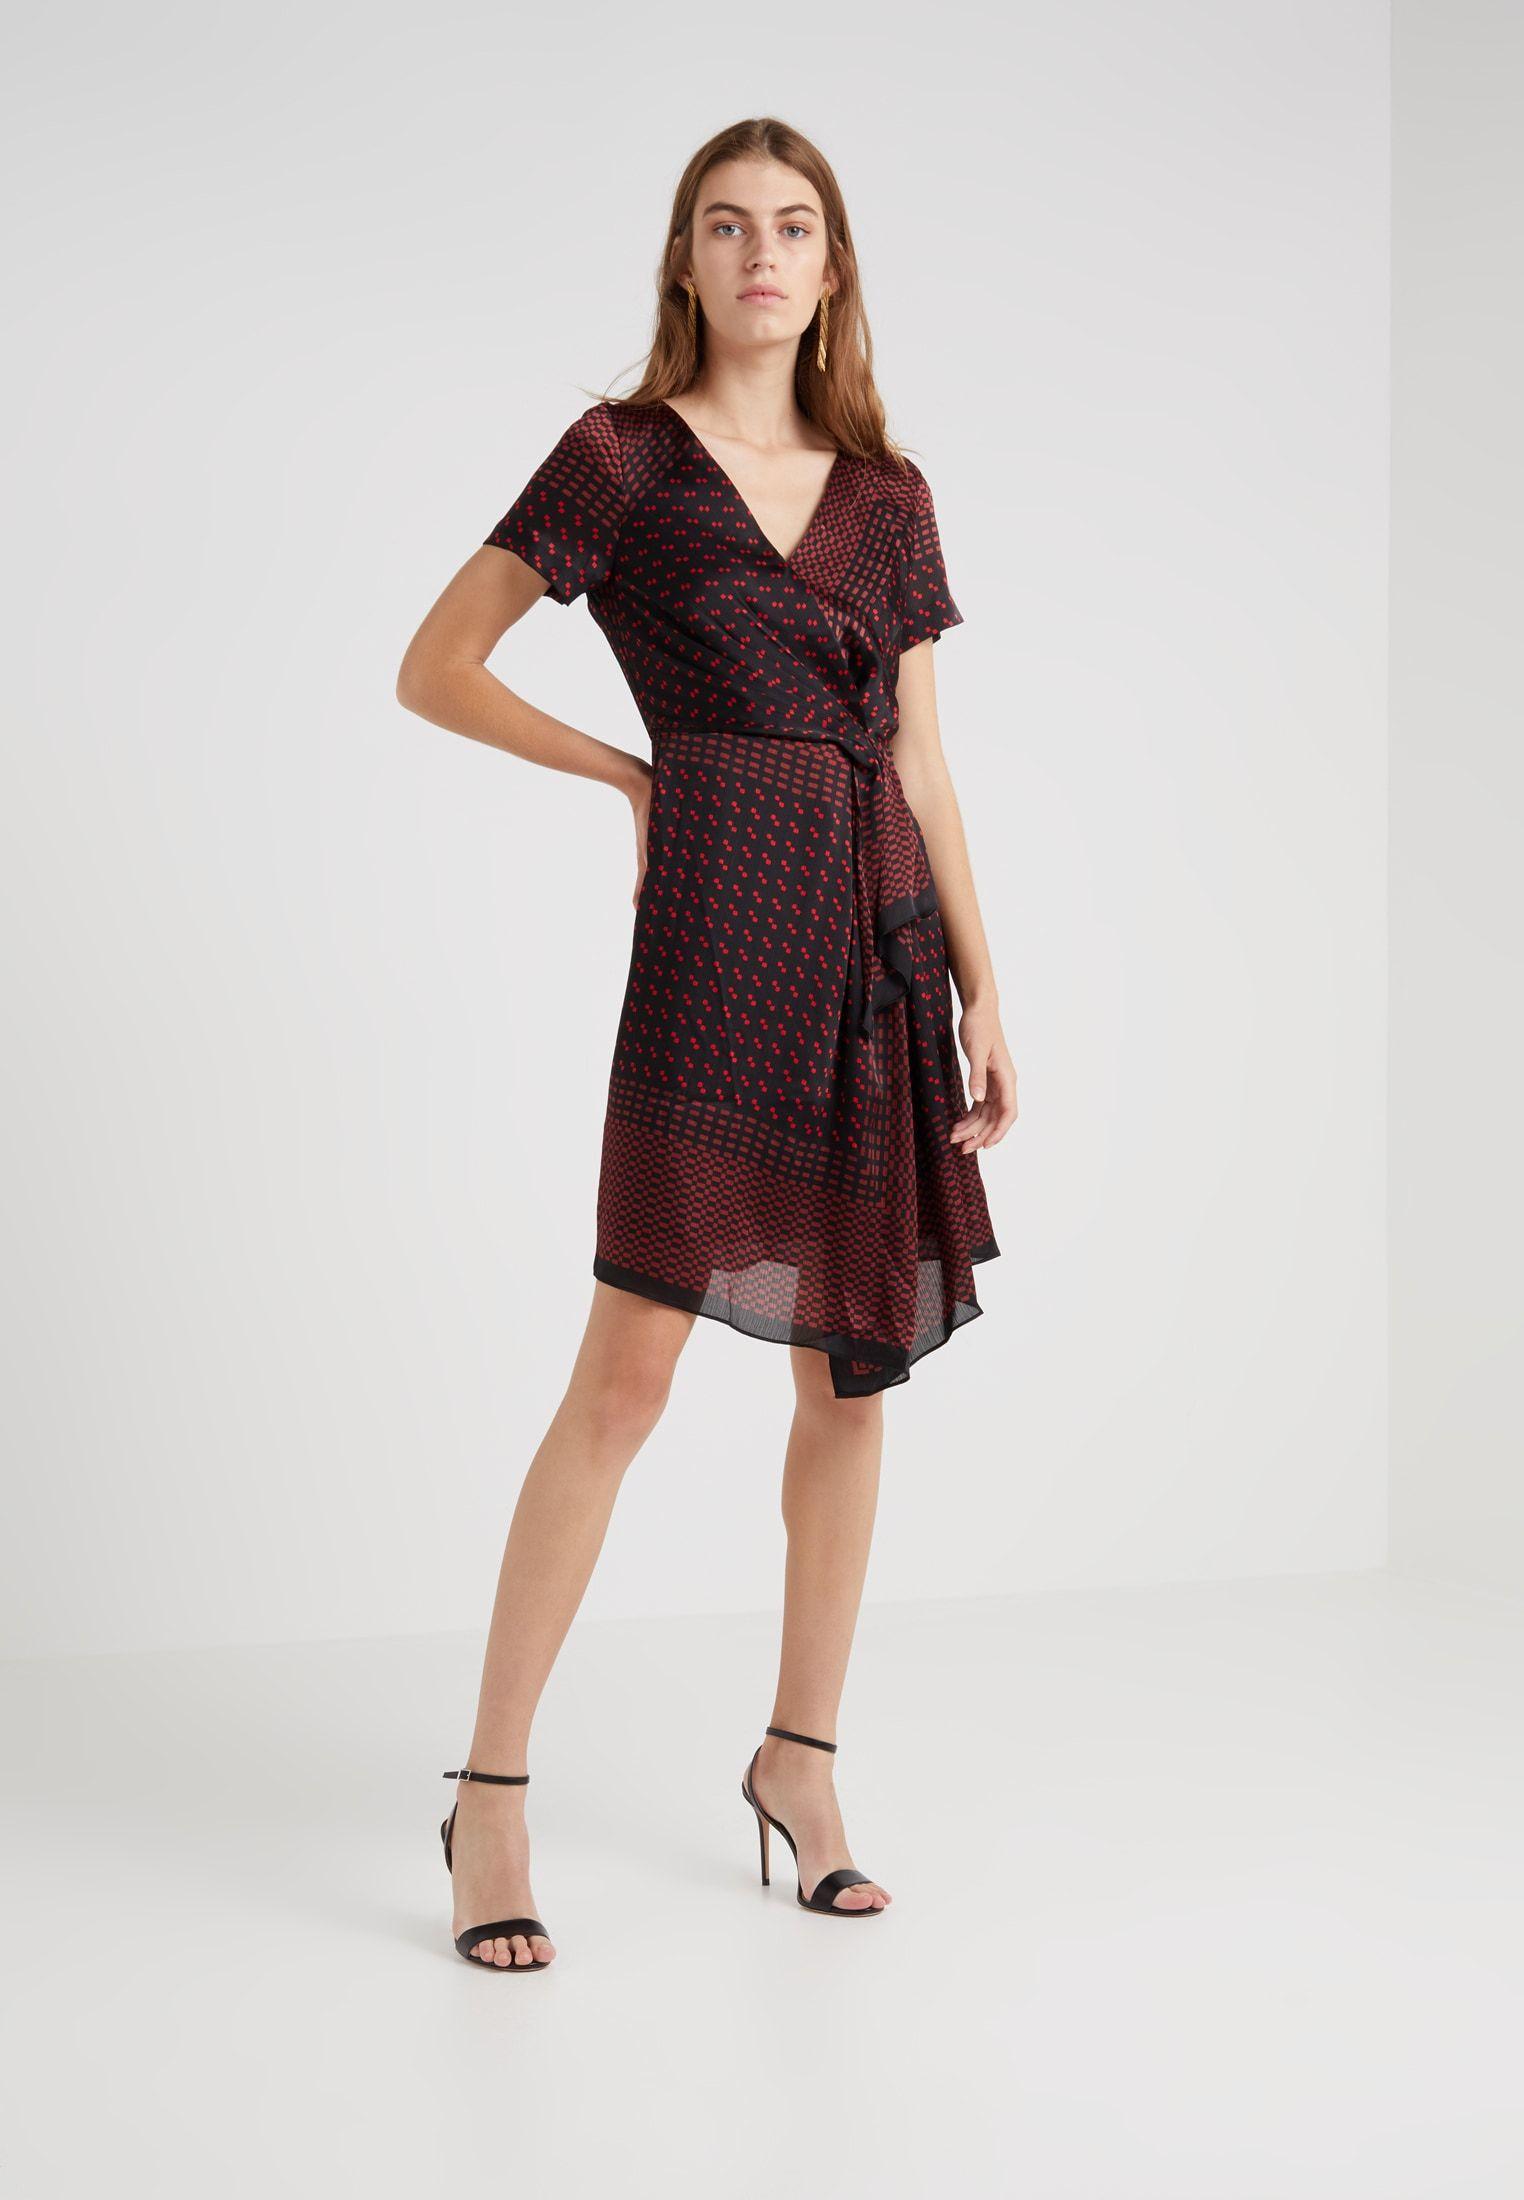 Club Monaco TARTEEN DRESS - Day dress - red - Zalando.co.uk   Dress ... d279f4a786f